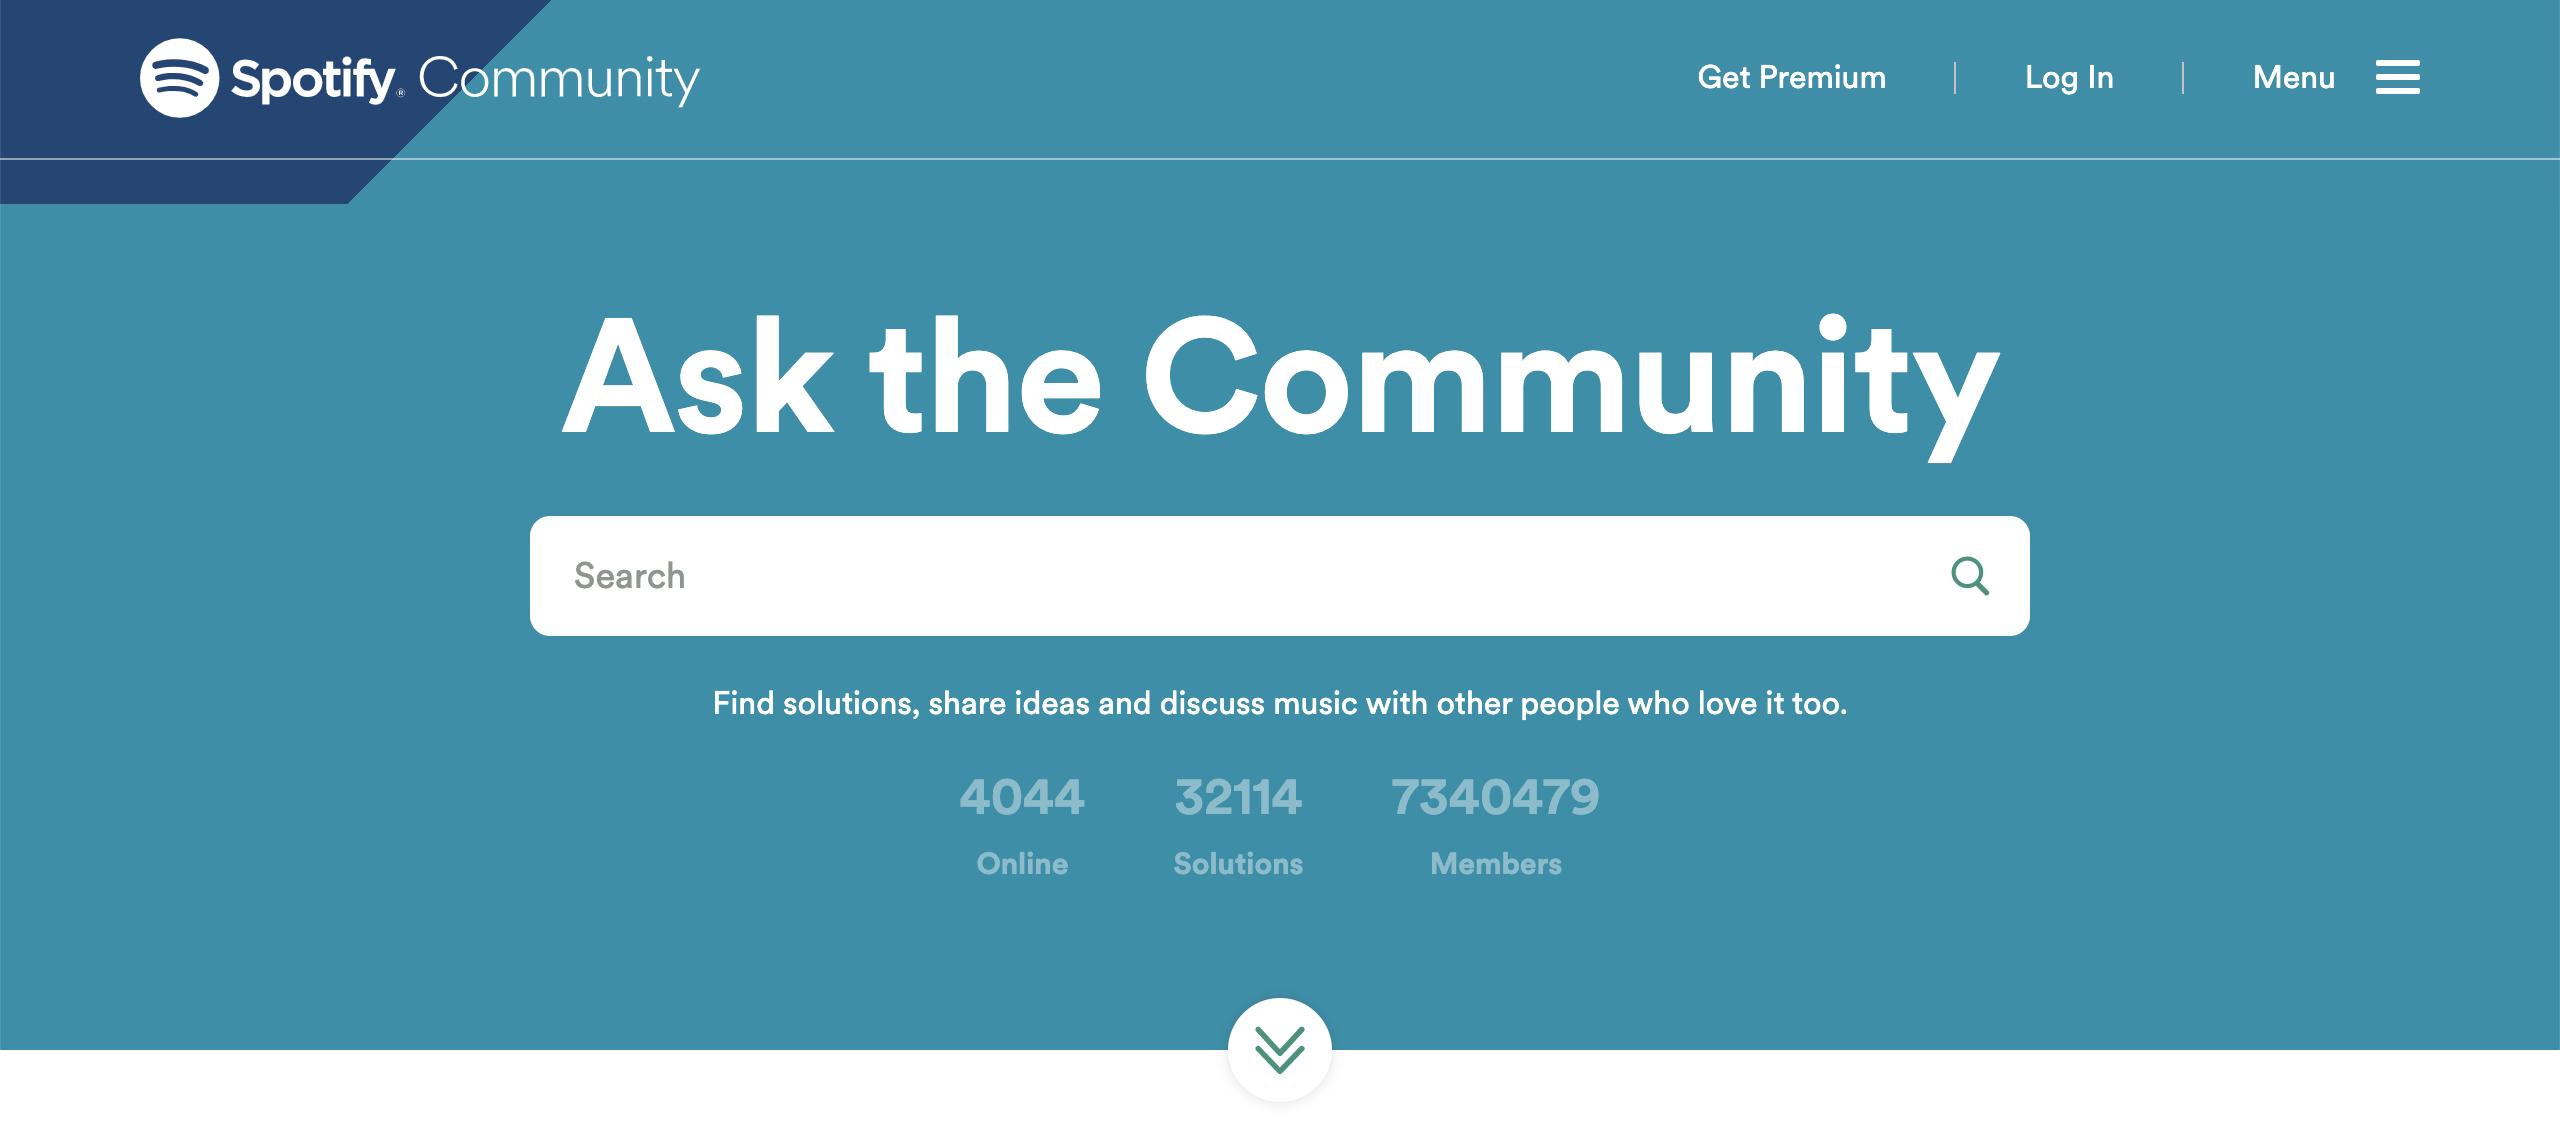 brand community - spotify's community forum